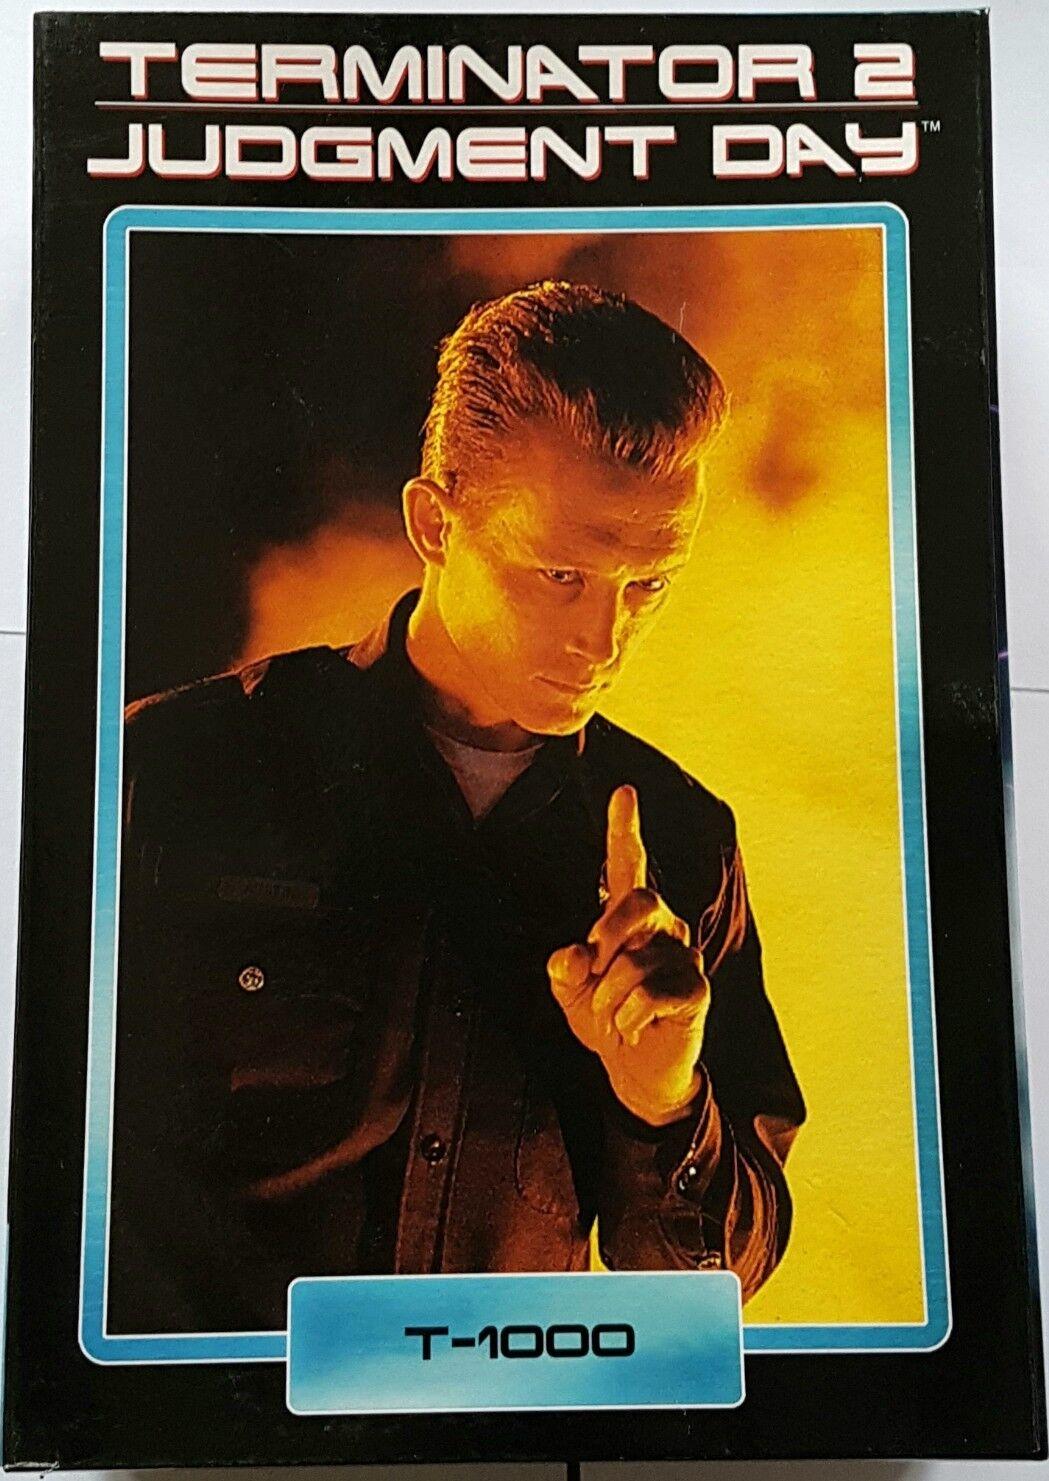 Terminator 2 (Judgment Day) Ultimate T-1000 Cop - 7  action figure (NECA)